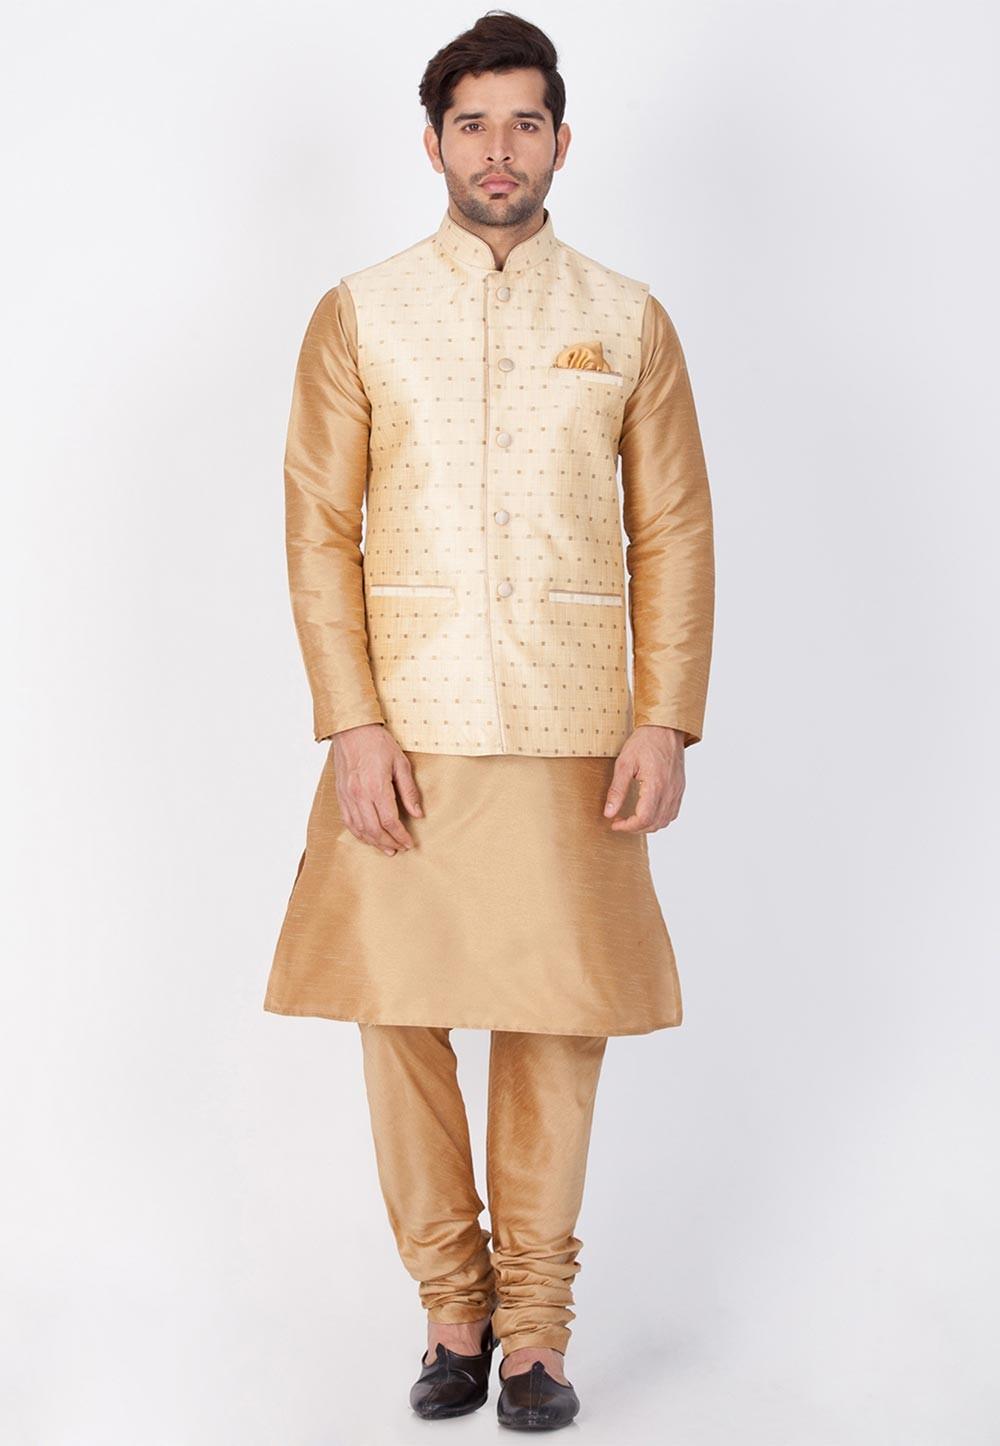 Golden,Cream Color Readymade Latest Kurta Pajama with Nehru Jacket